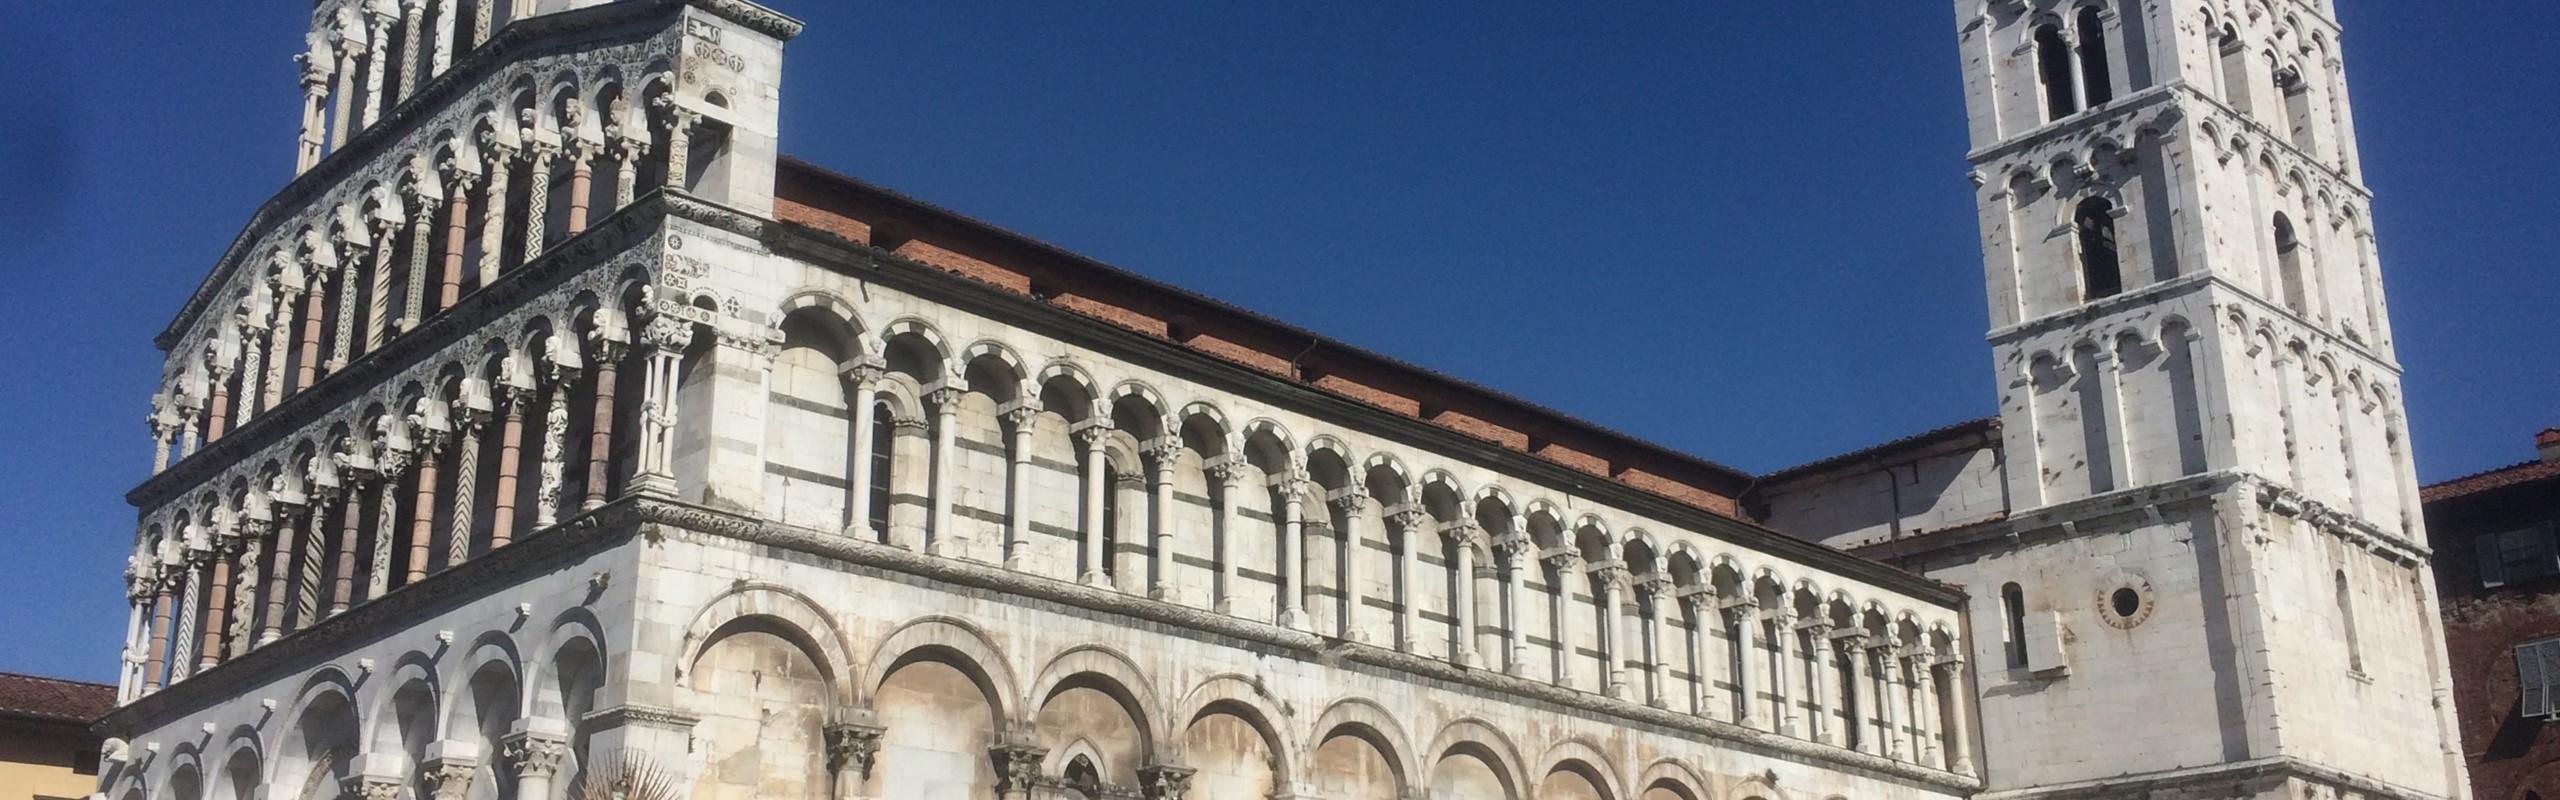 Lucca San MicheleIMG_0280.jpg